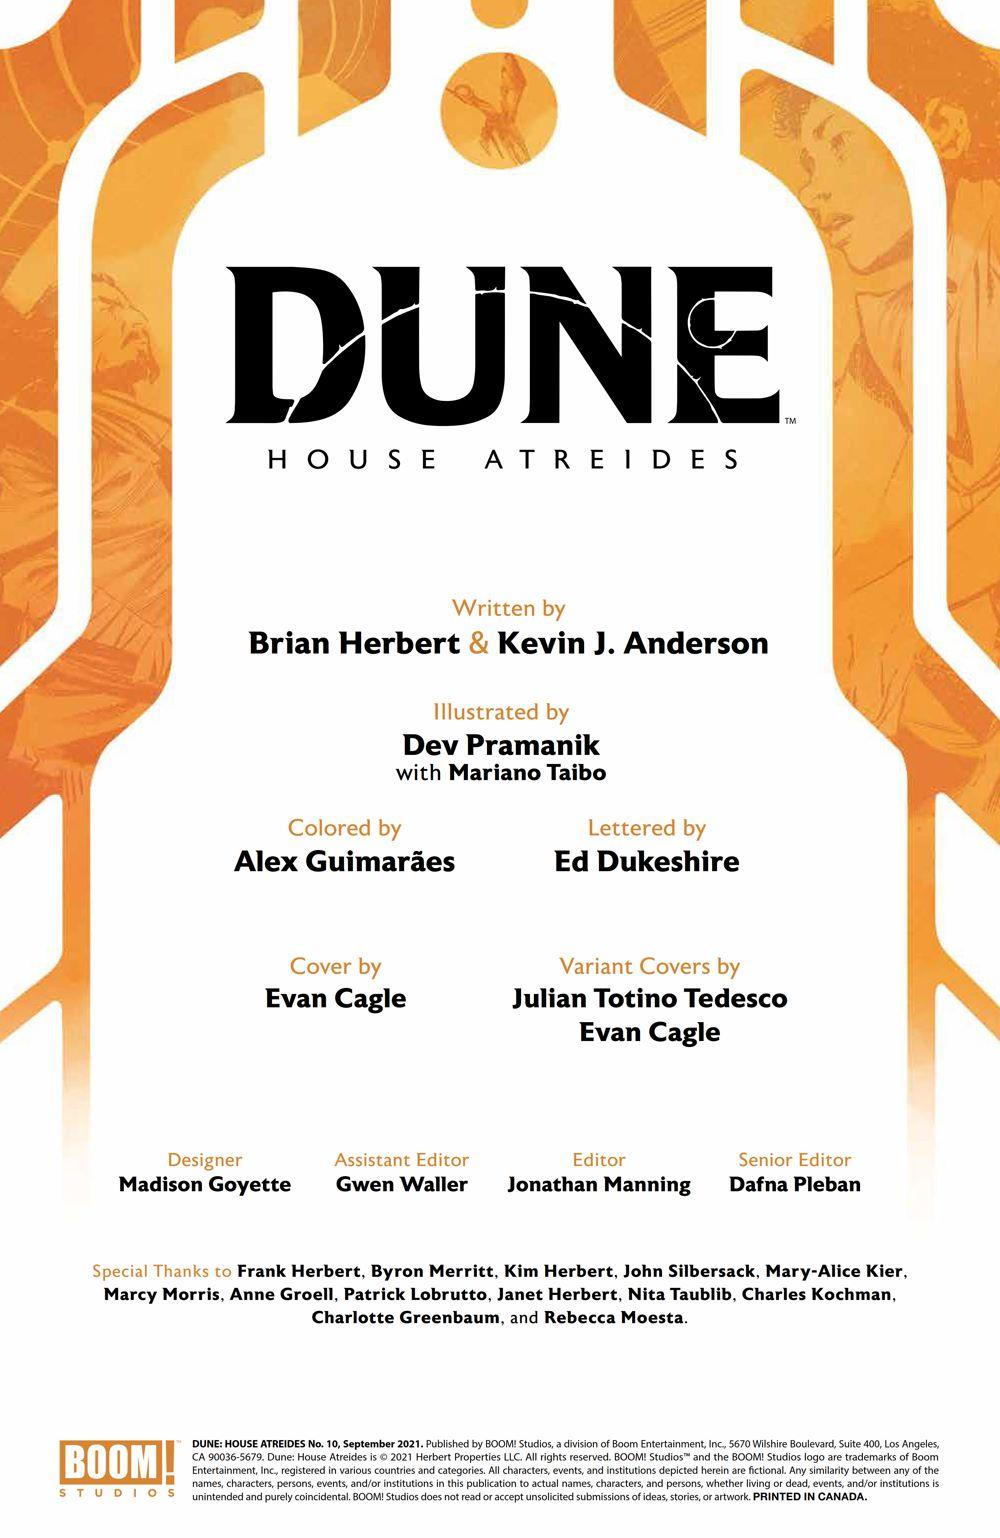 Dune_HouseAtreides_010_PRESS_2 ComicList Previews: DUNE HOUSE ATREIDES #10 (OF 12)